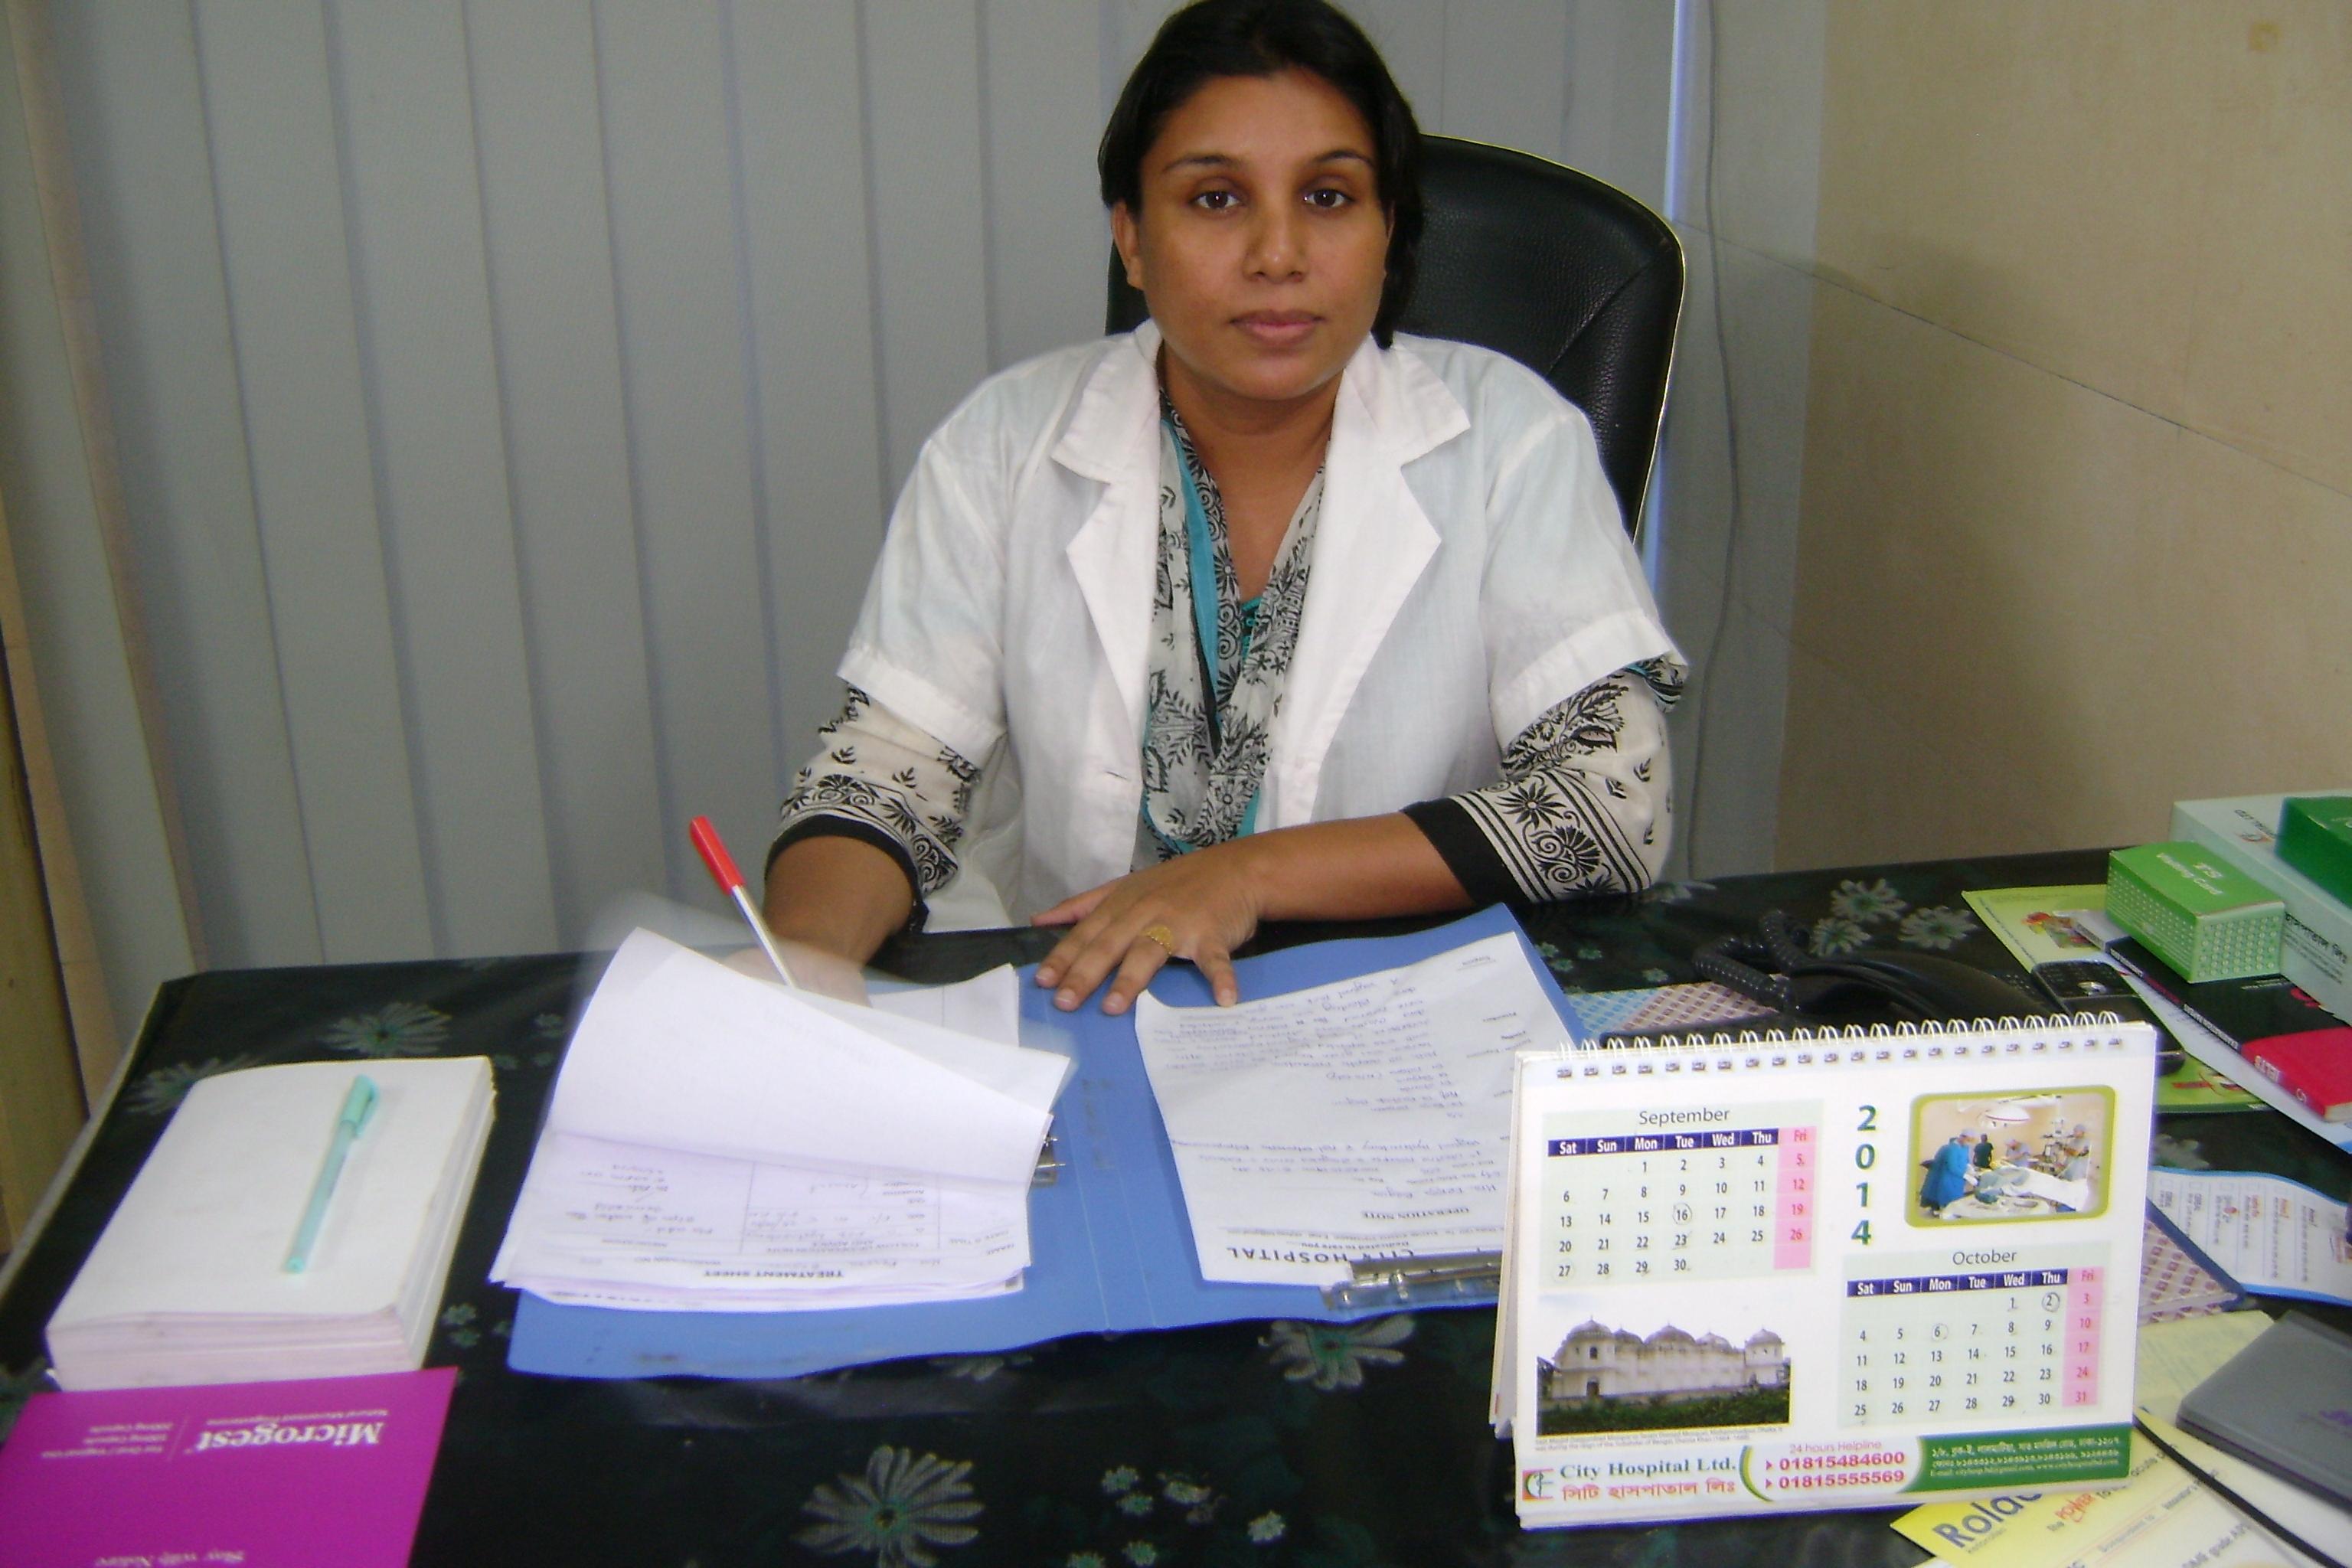 Medicine & Diabetes unit